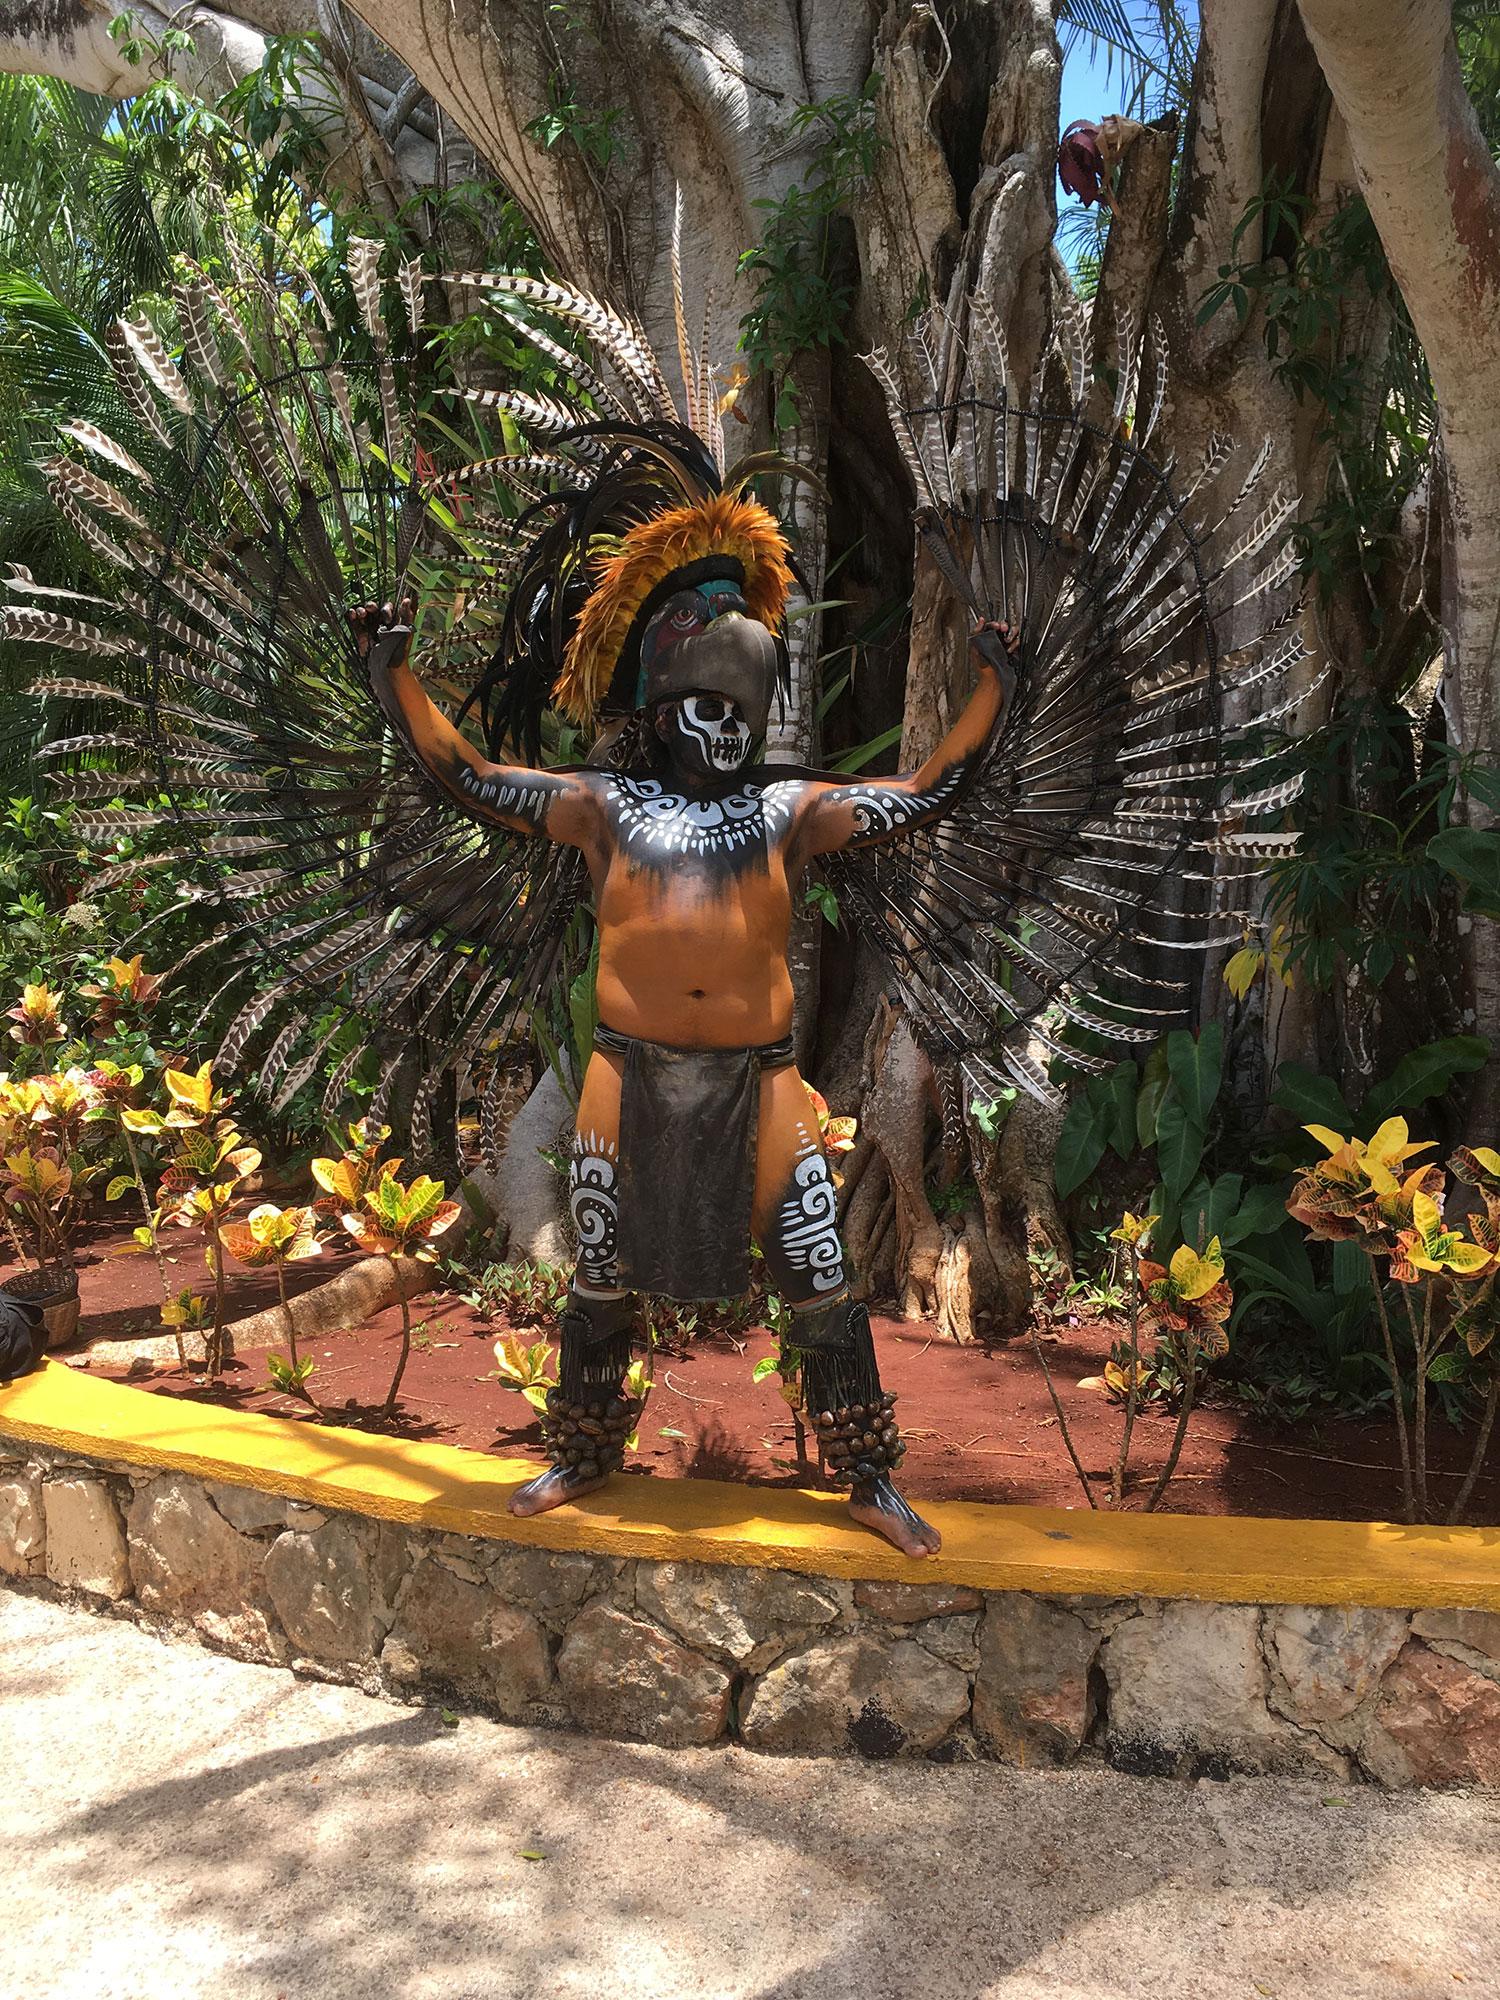 Hammocks_and_Ruins_What_to_Do_Mexico_Mayan_pyramid_cenote_Ik_Kil_9.jpg